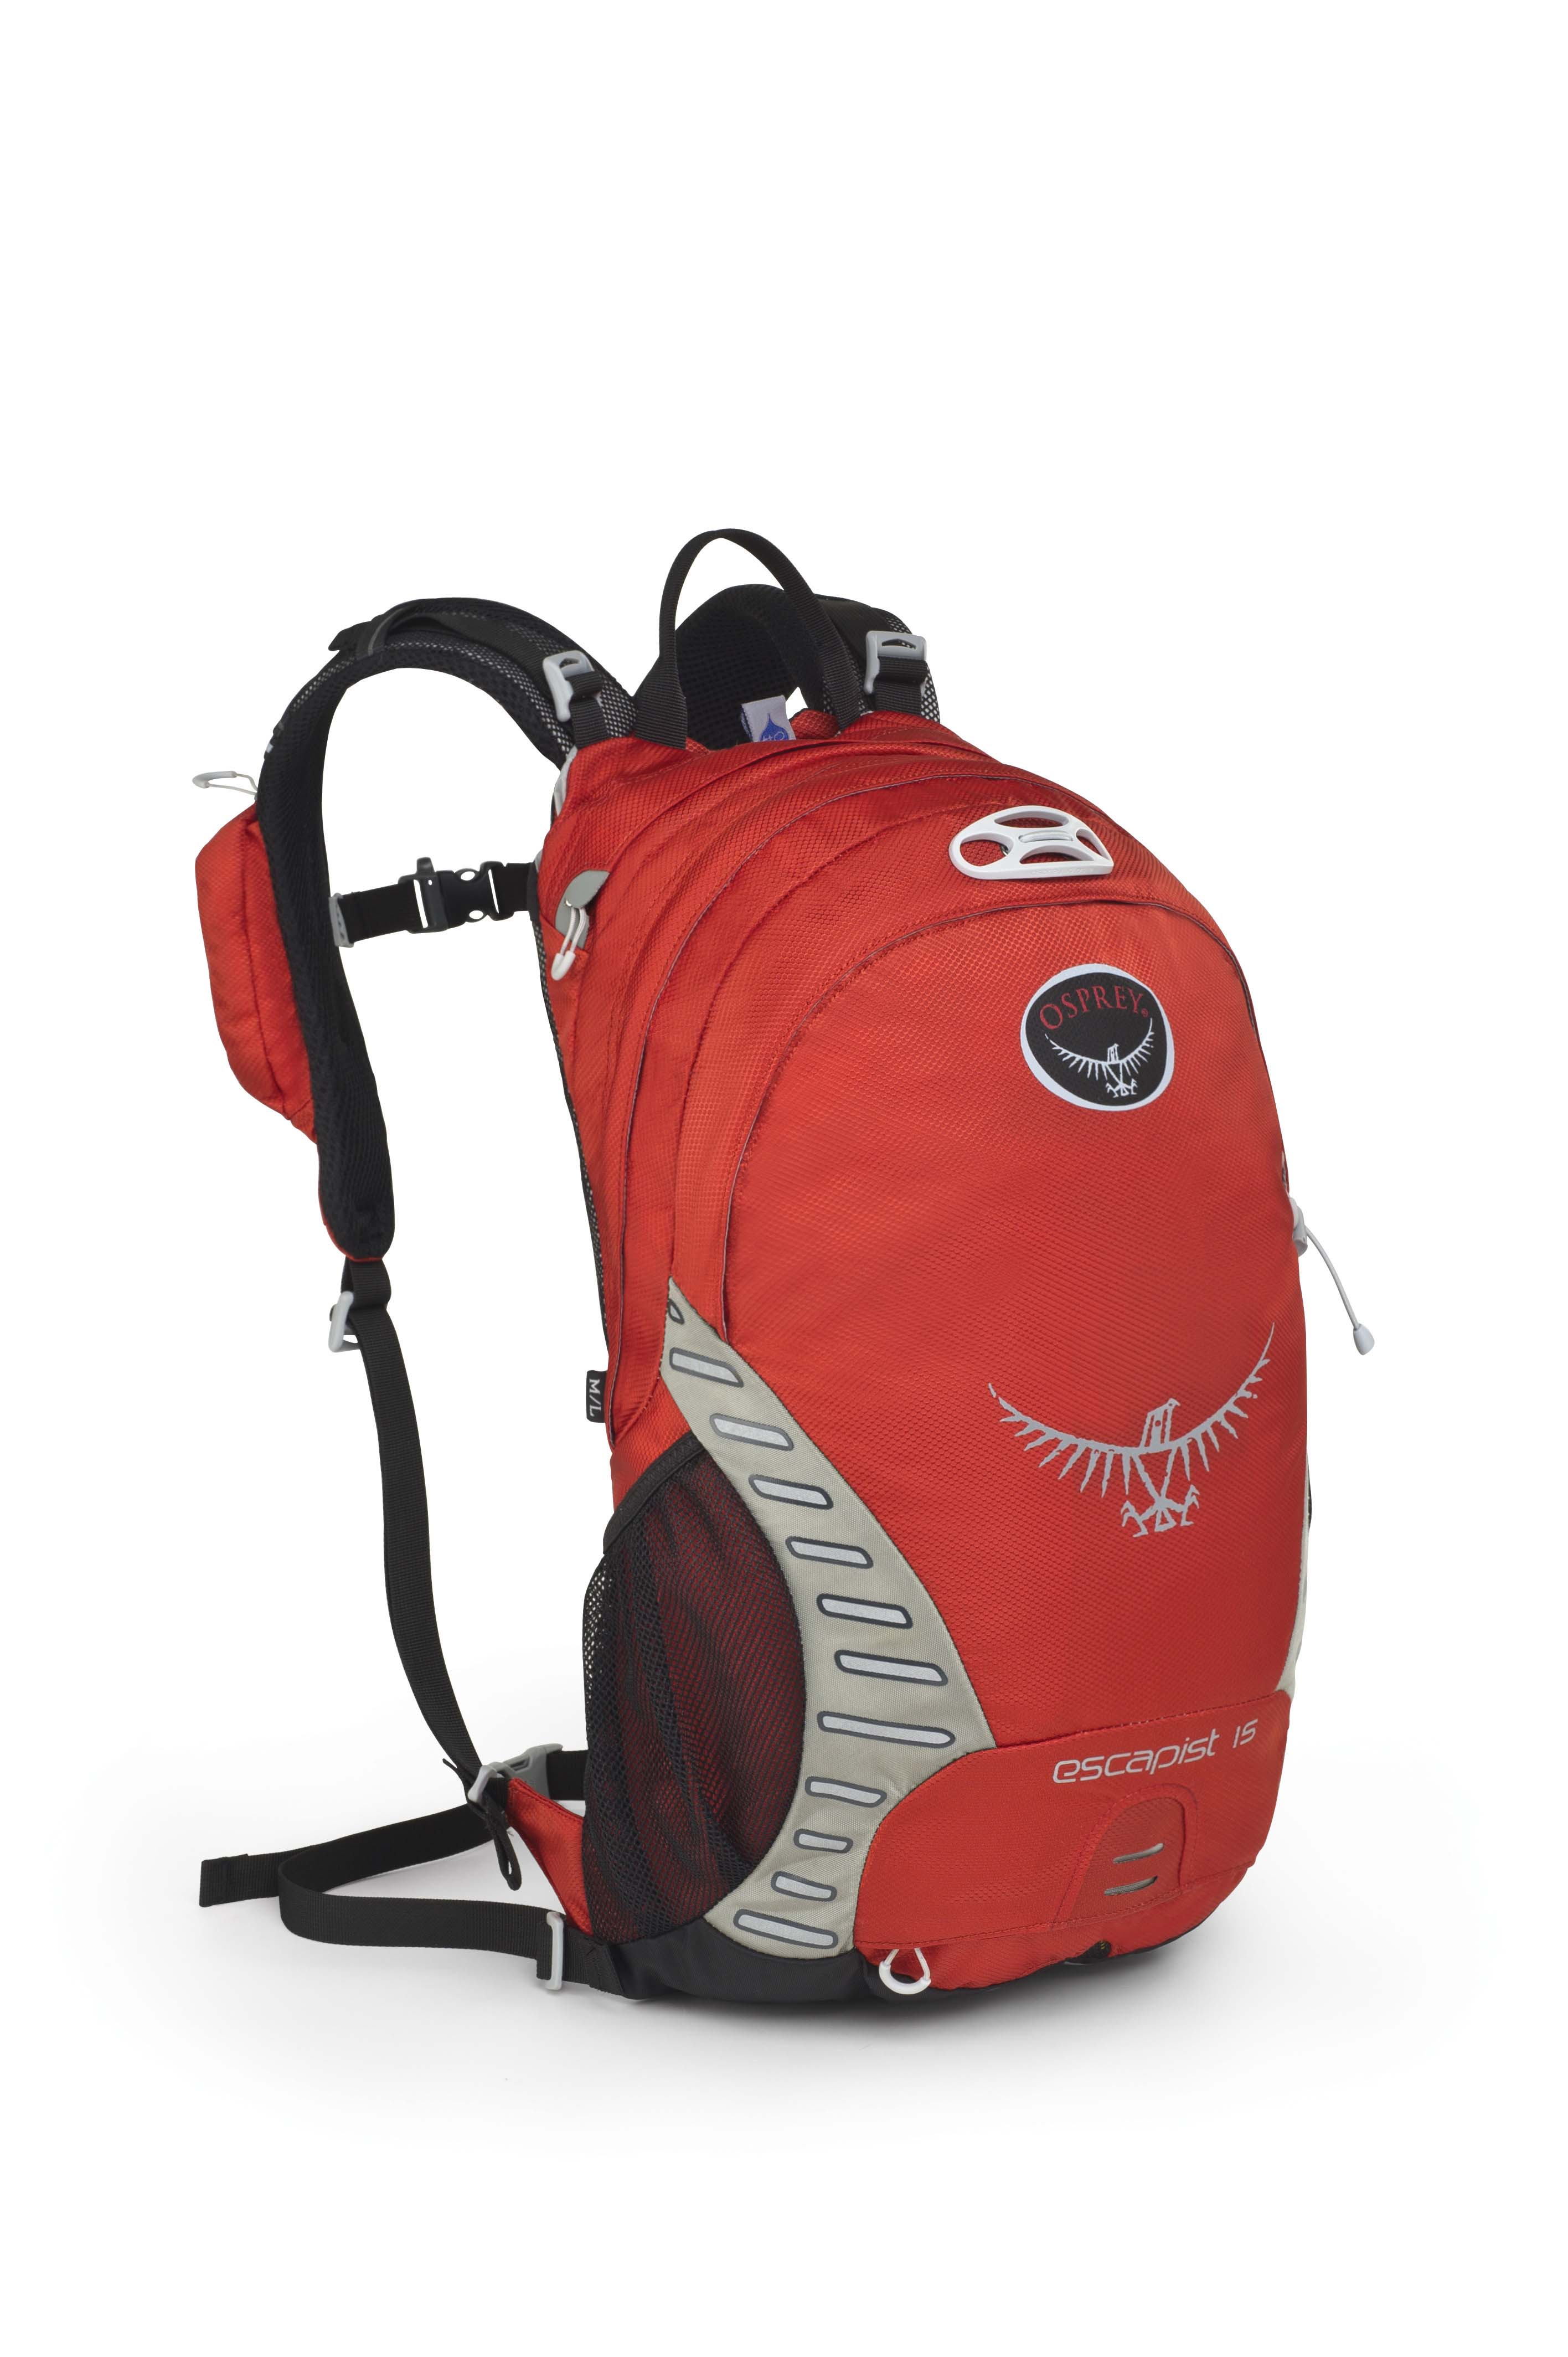 Osprey Escapist 15 Volcano-30